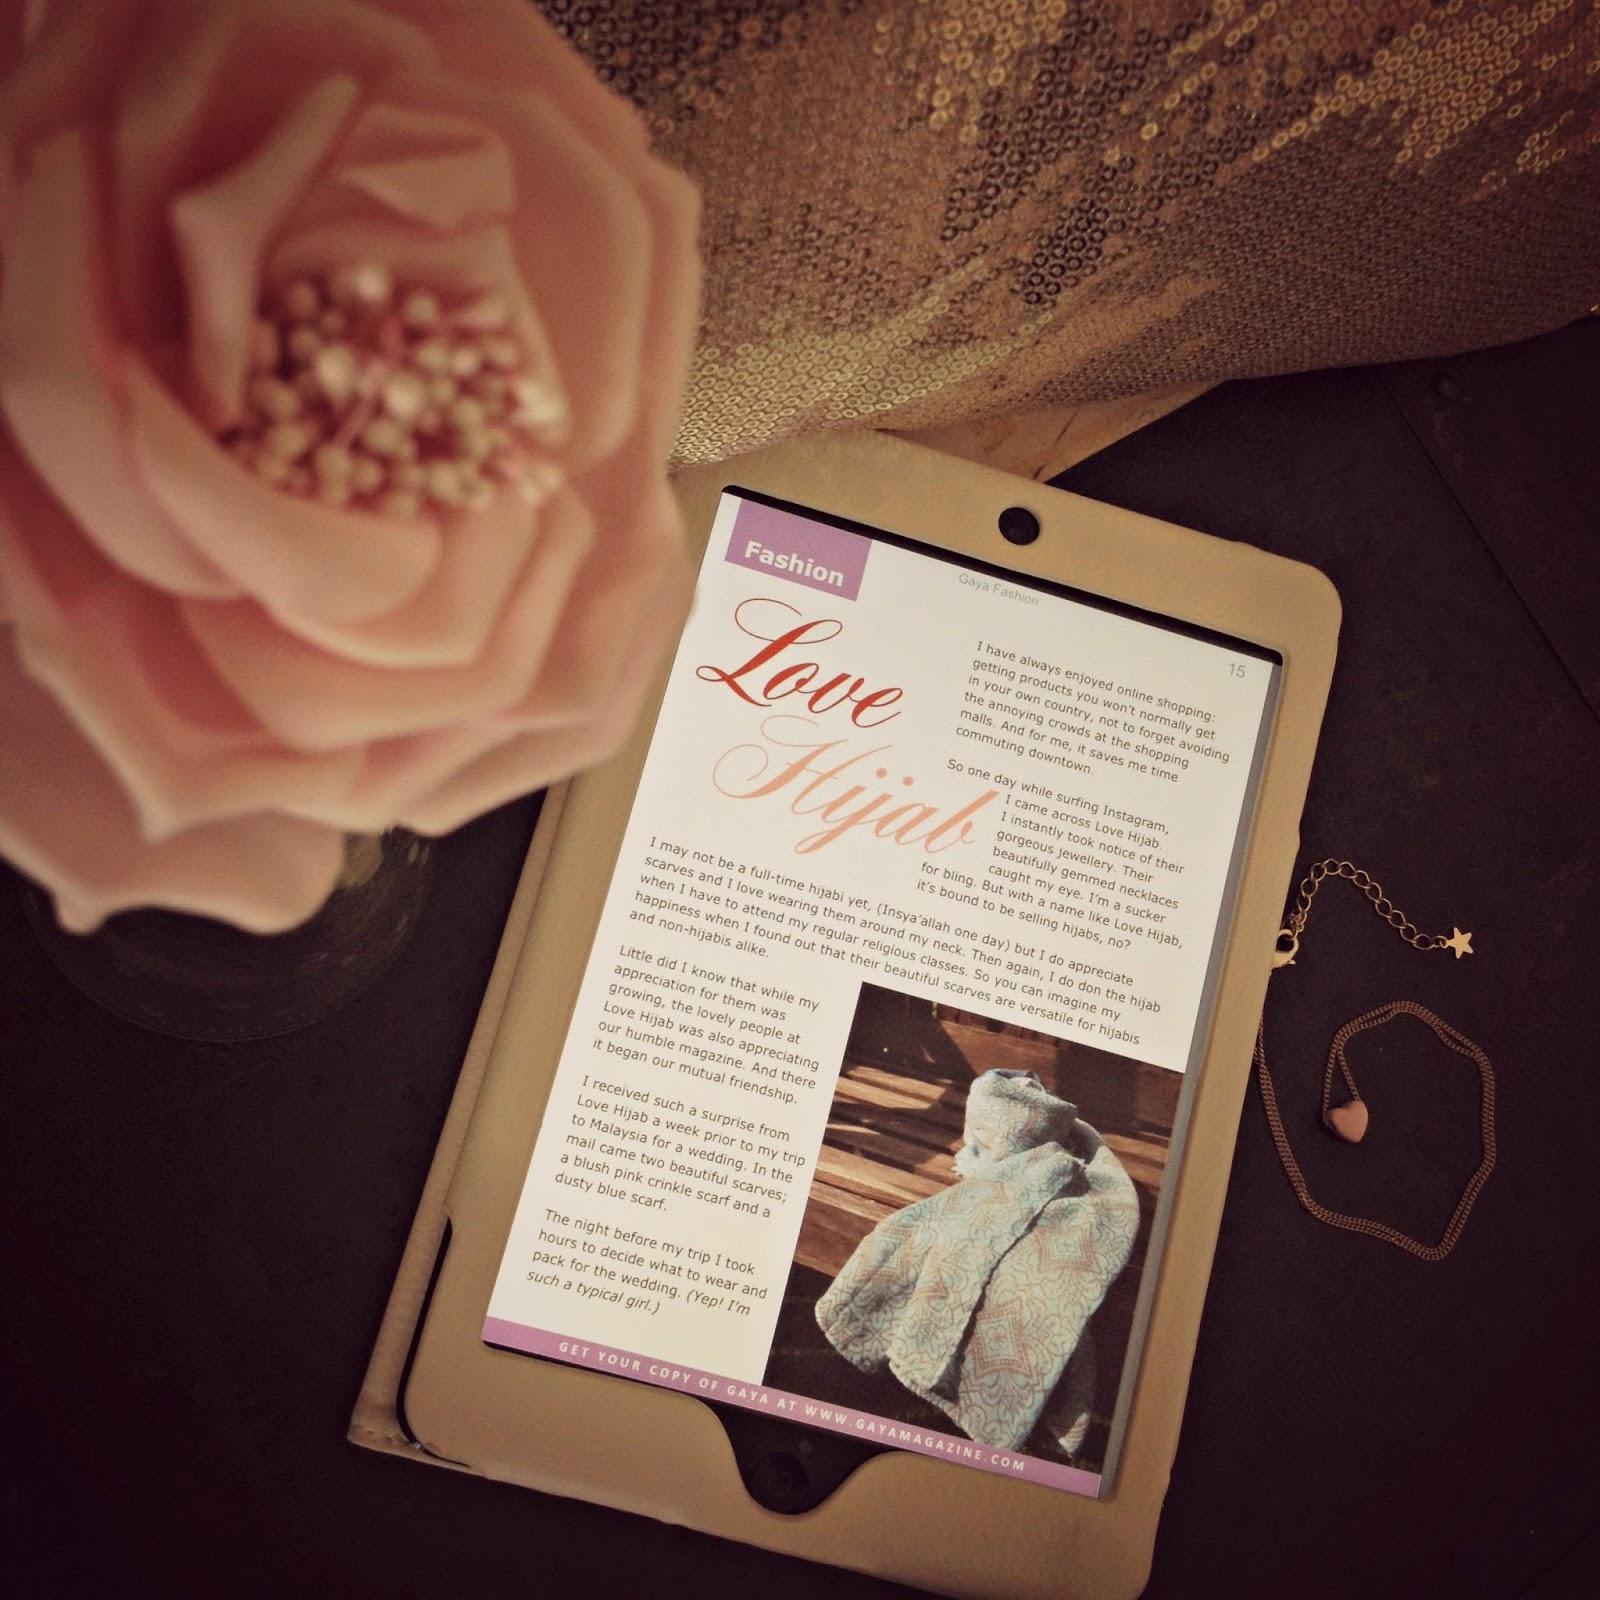 http://gayamagazine.wordpress.com/download-the-issues-here/